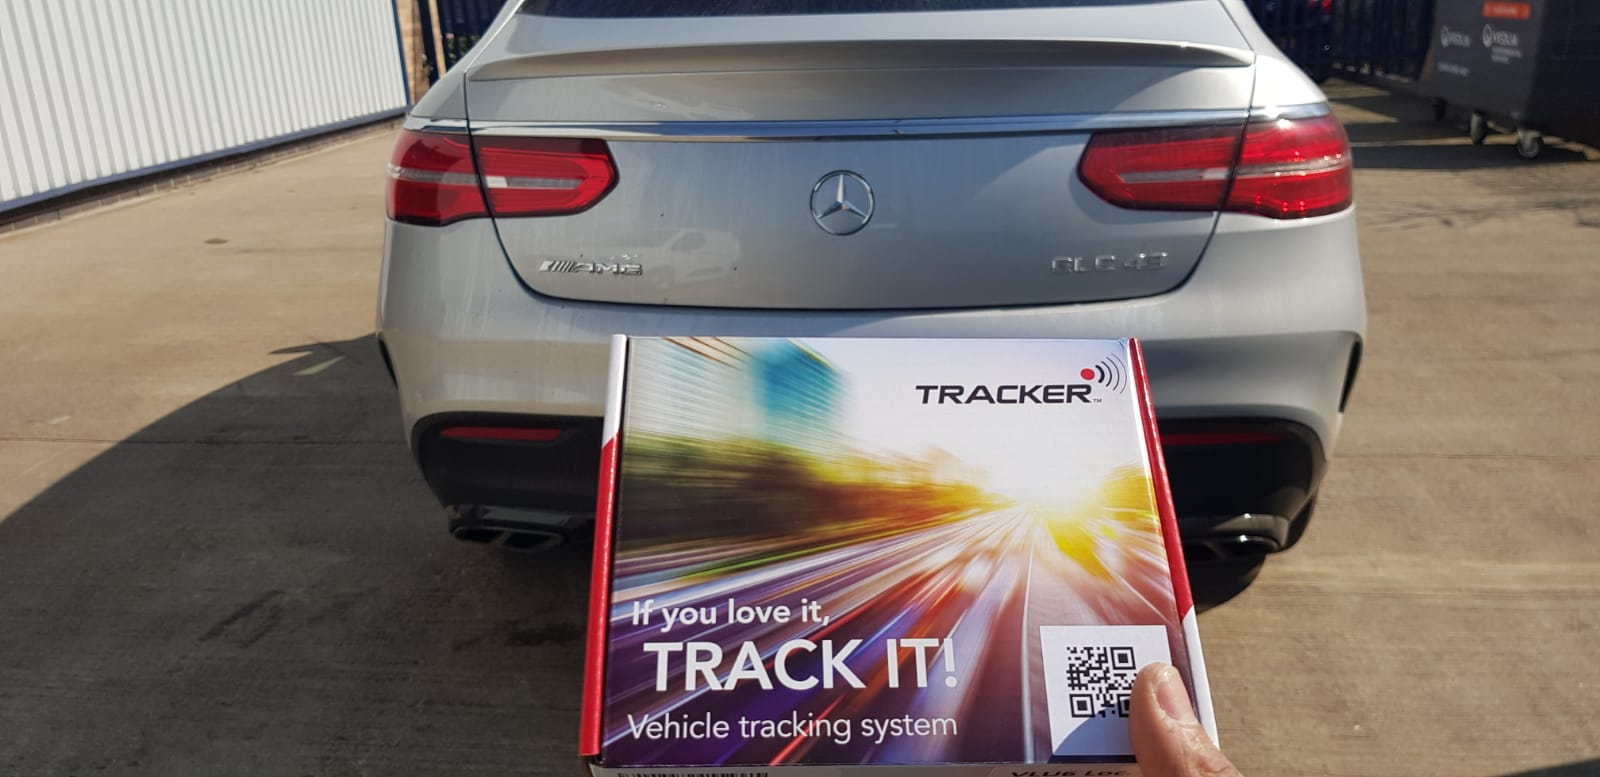 Mercedes Tracker Vantage Plus S5